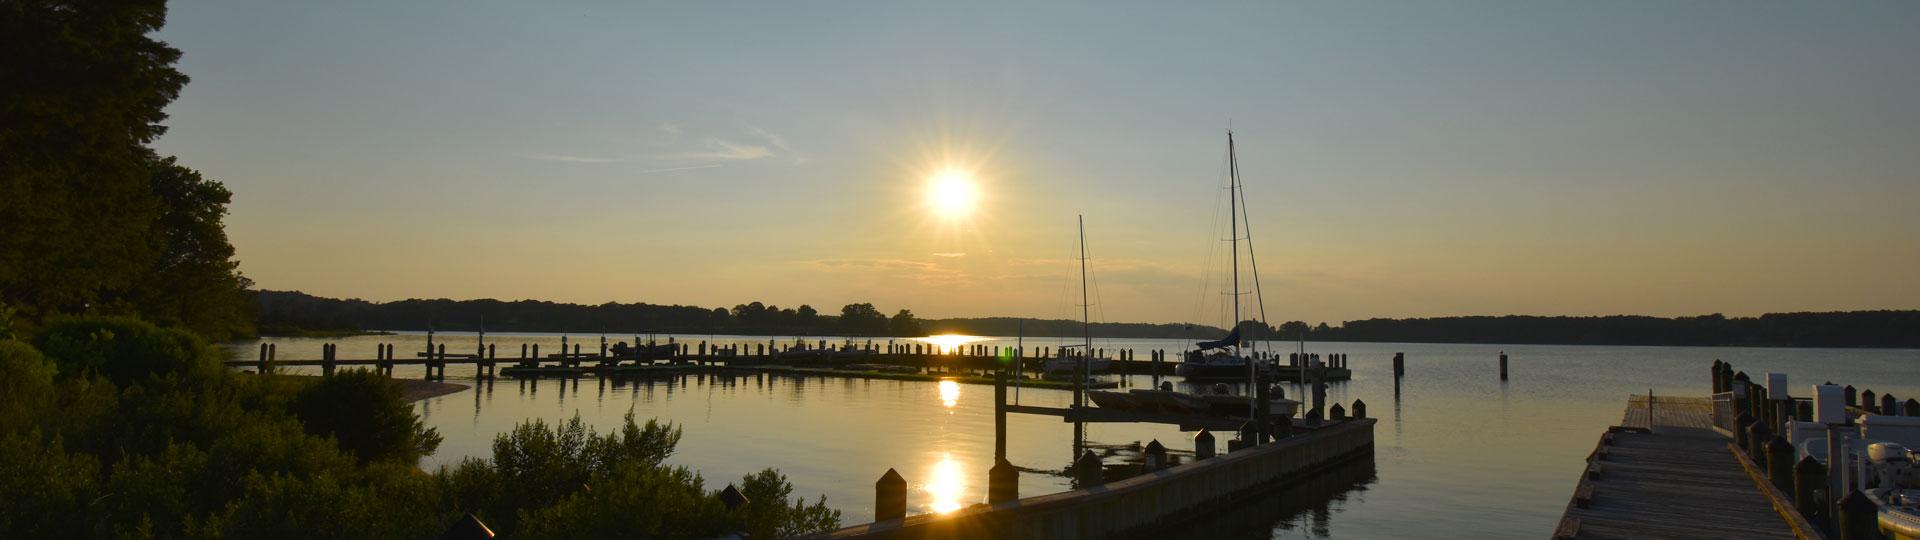 SMCM riverfront at sunset